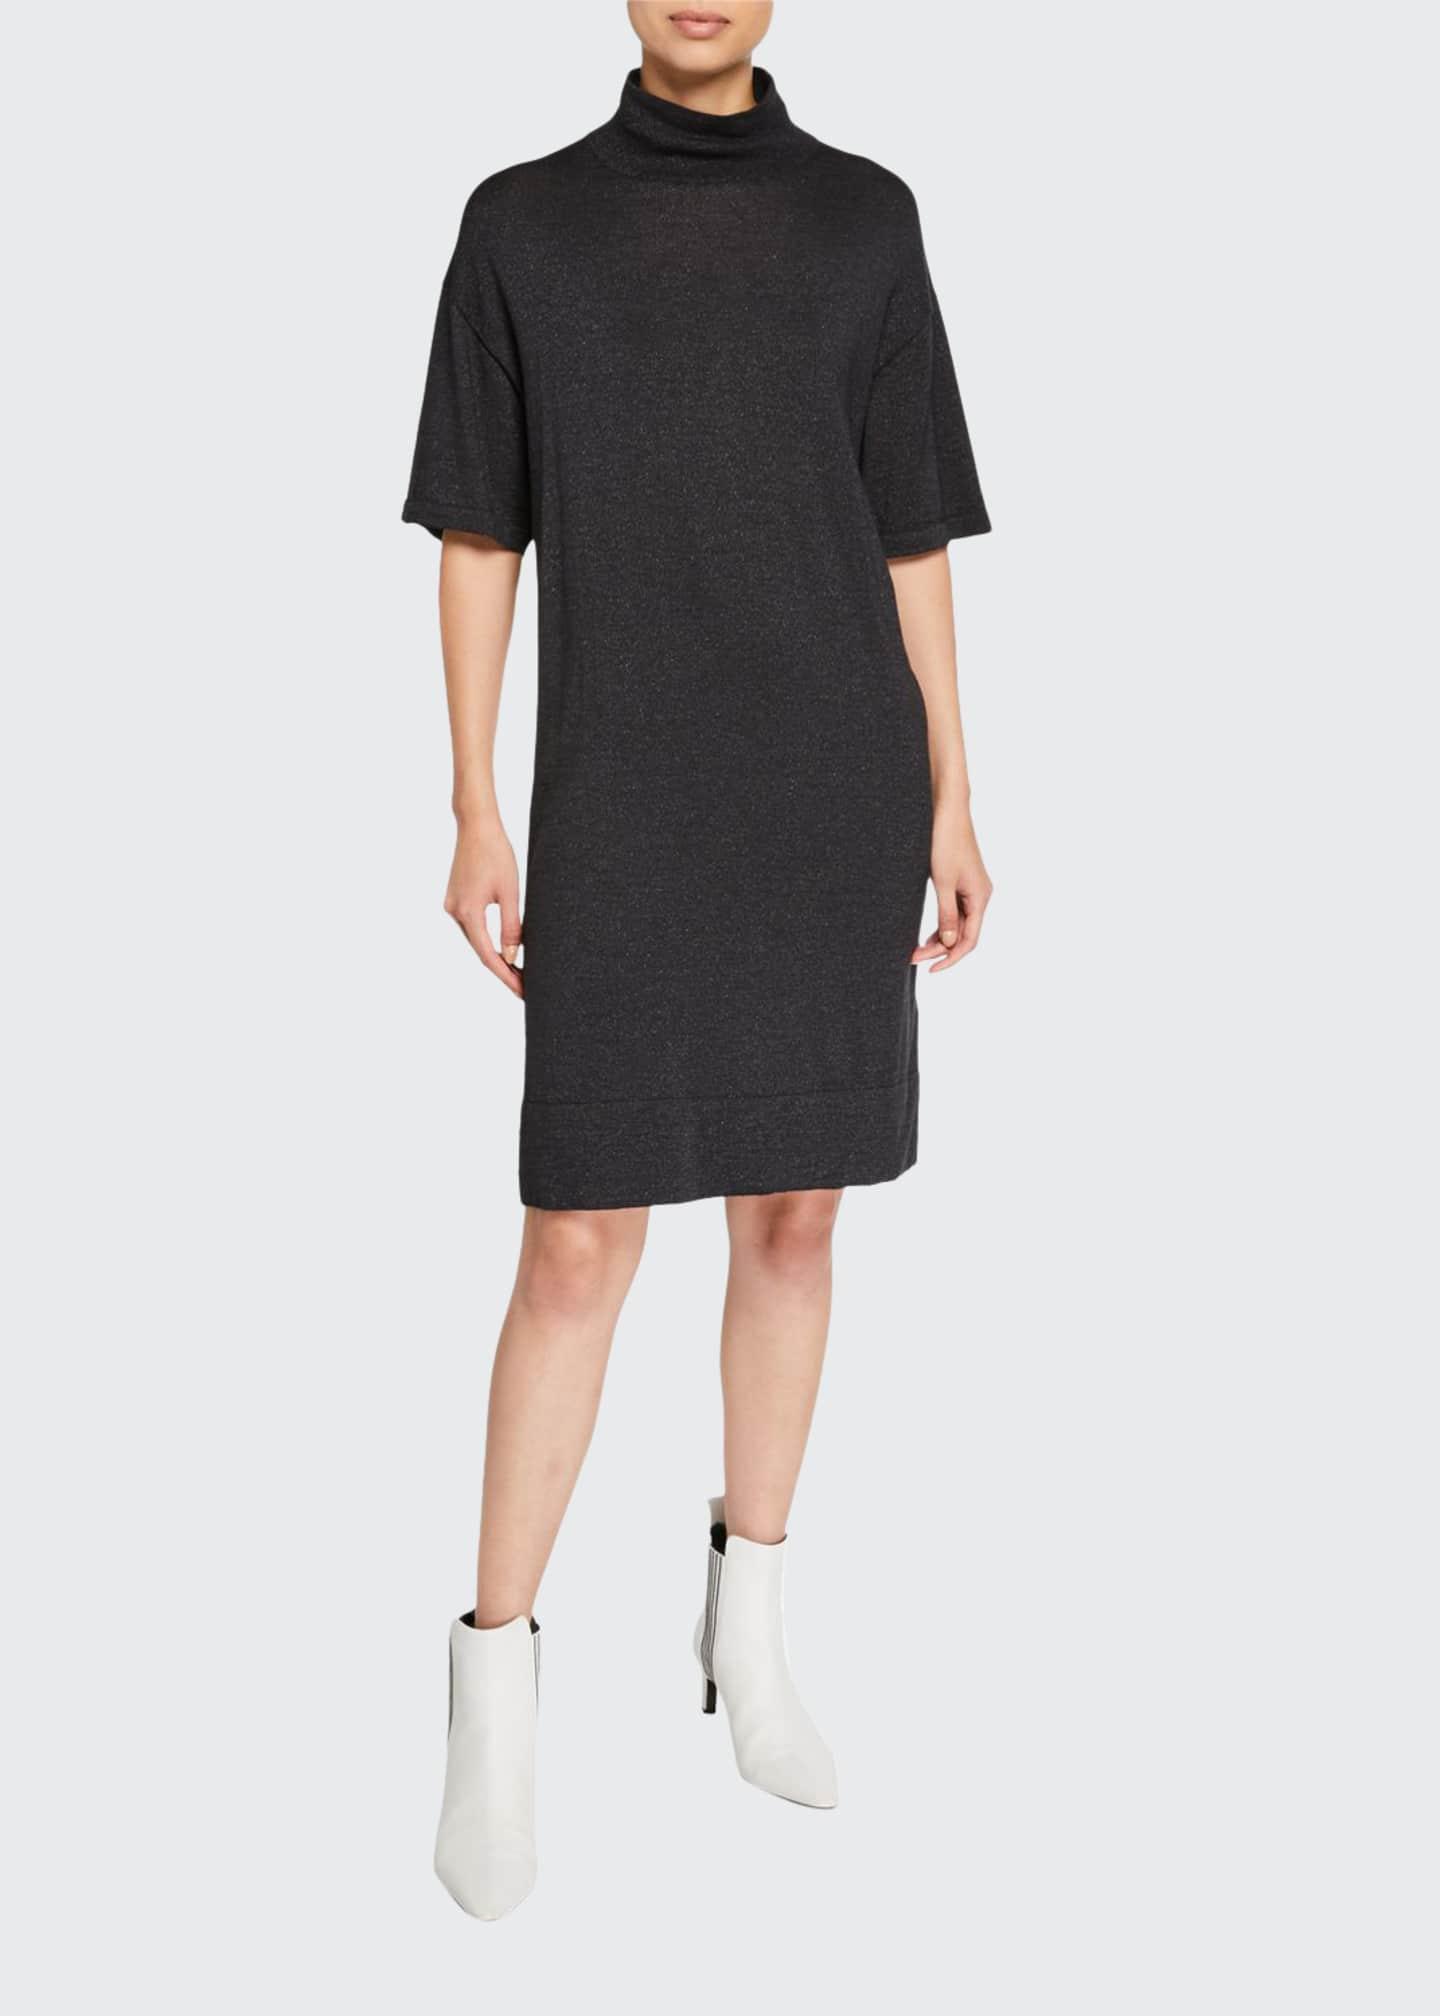 Brunello Cucinelli Shimmer Cashmere-Silk Mock-Neck Dress